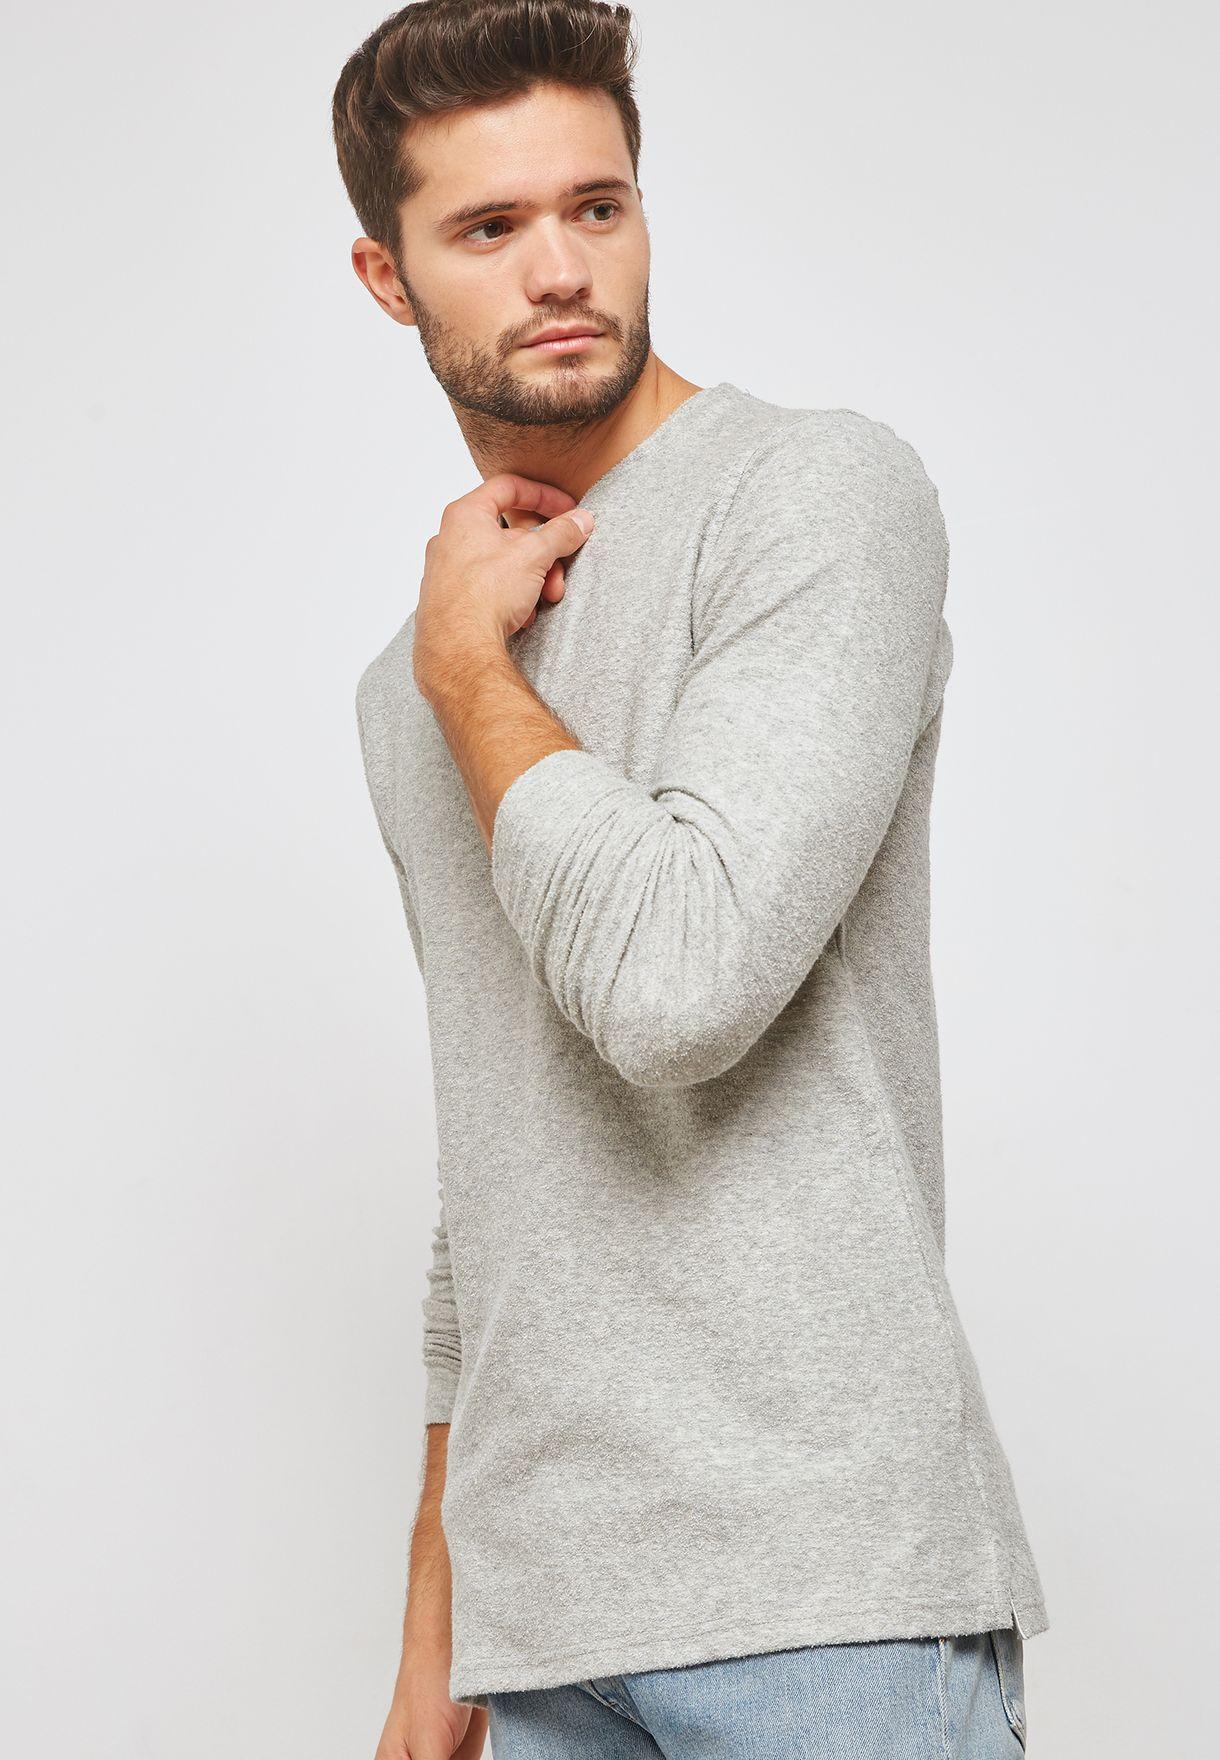 Ferhill Sweatshirt